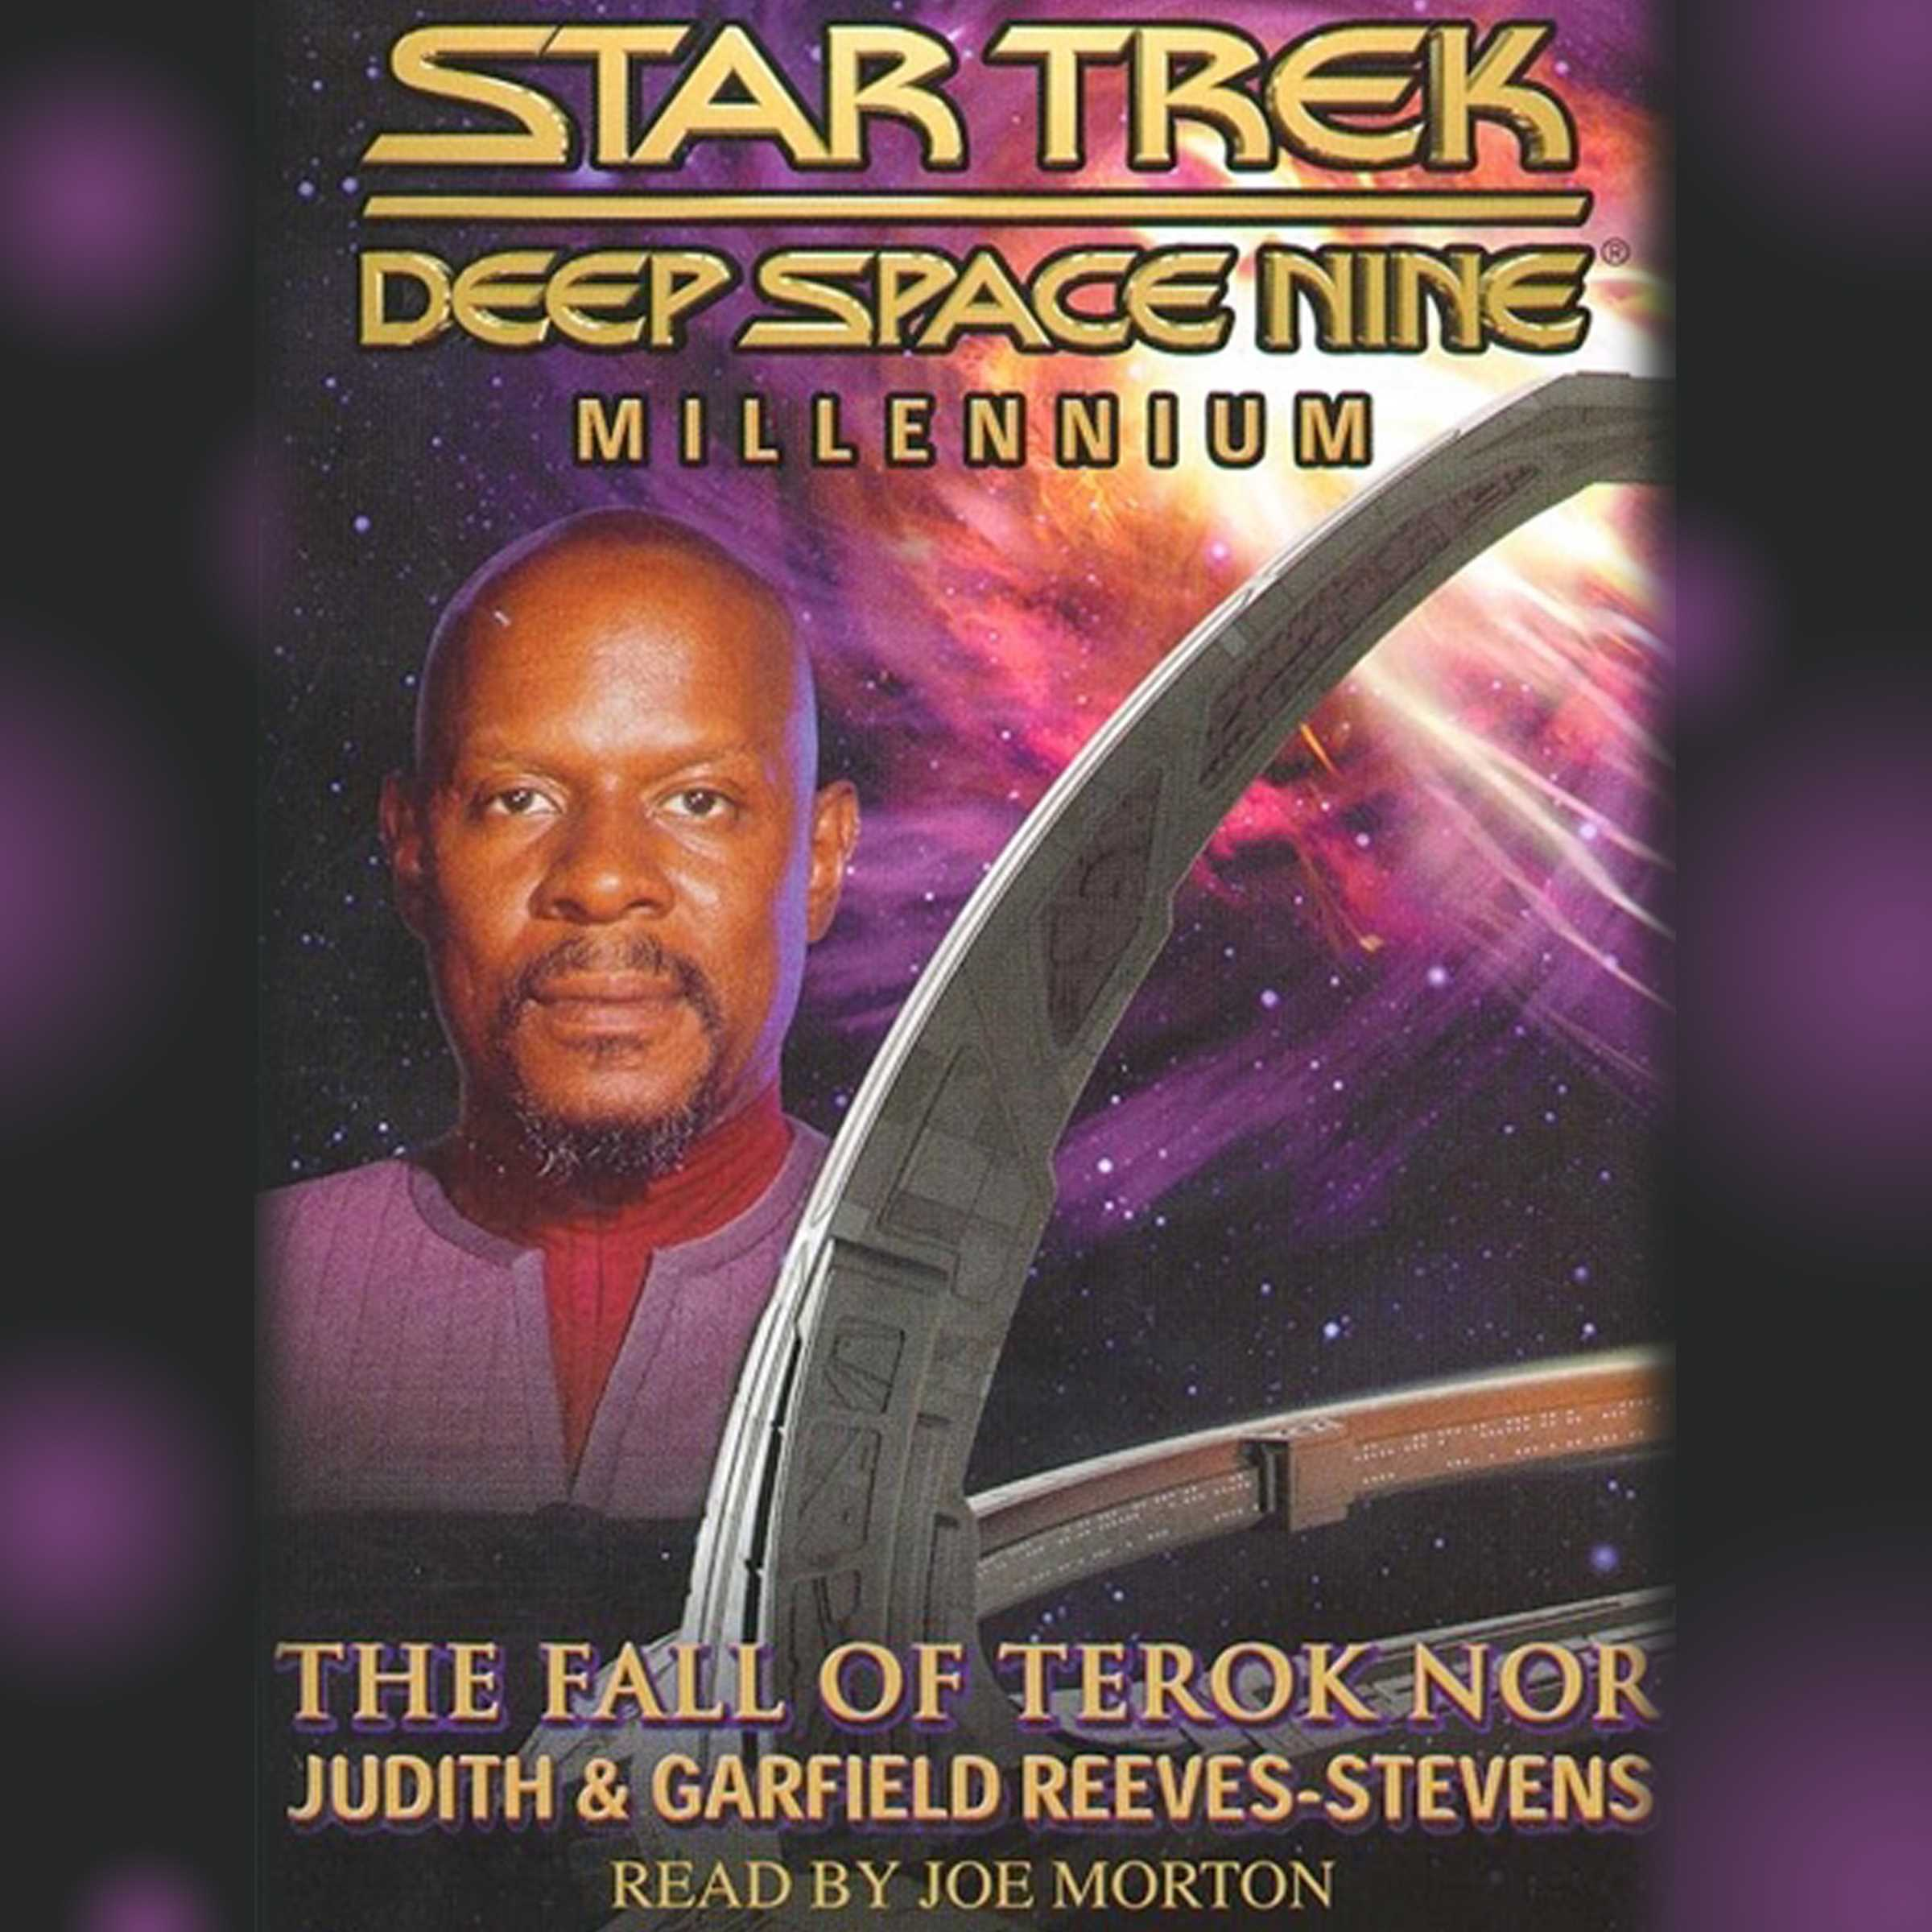 Star trek deep space 9 millenium 9780743519564 hr